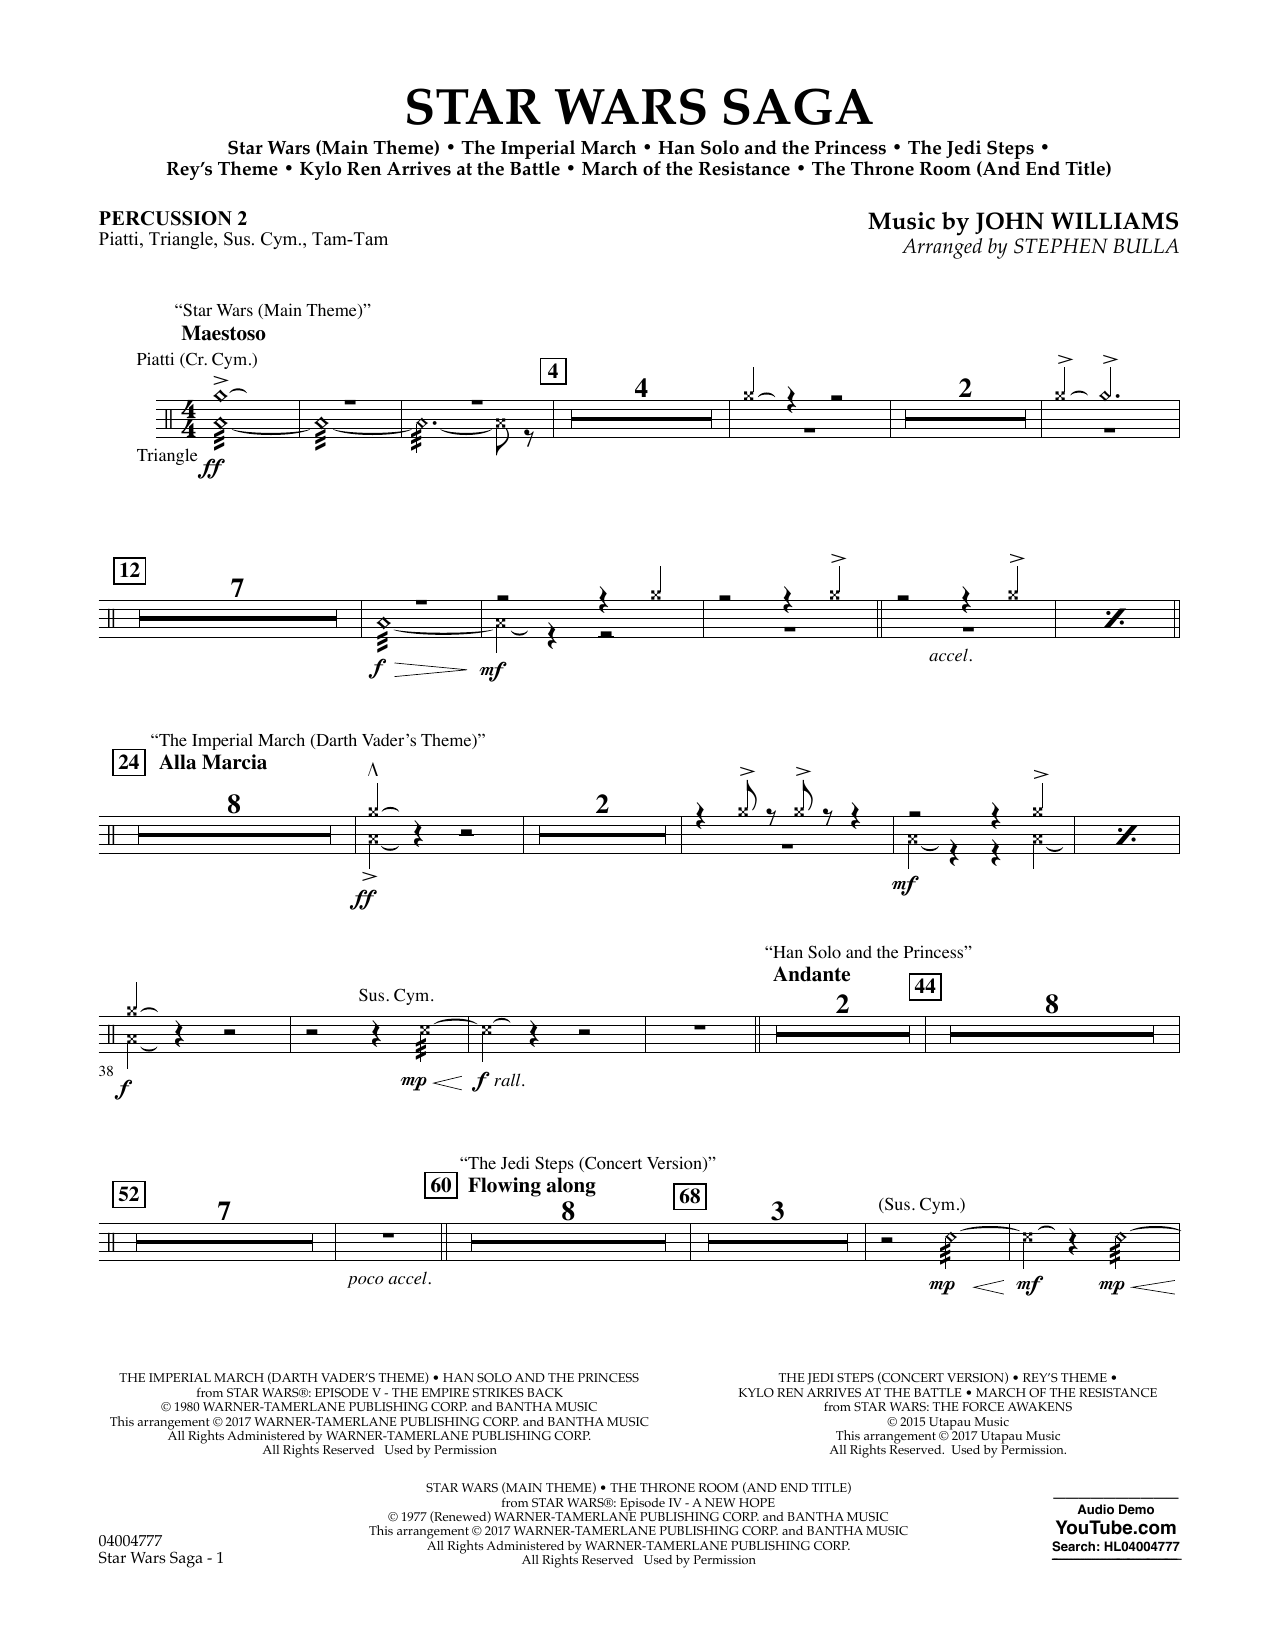 Star Wars Saga - Percussion 2 Sheet Music